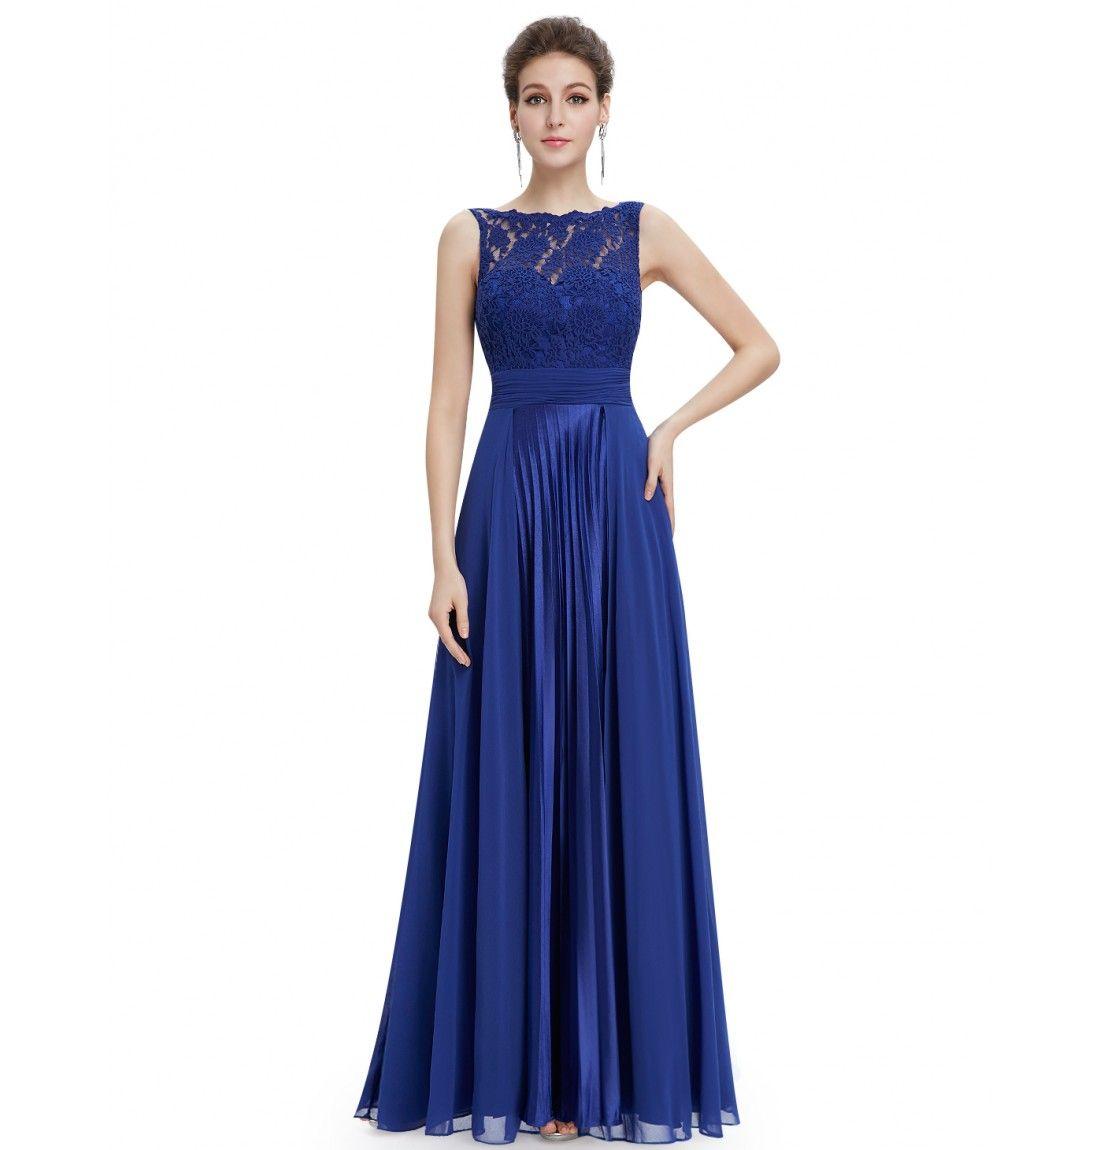 Elegantes Brautjungfer Abendkleid Blau Rundhals | Vestidos de novia ...